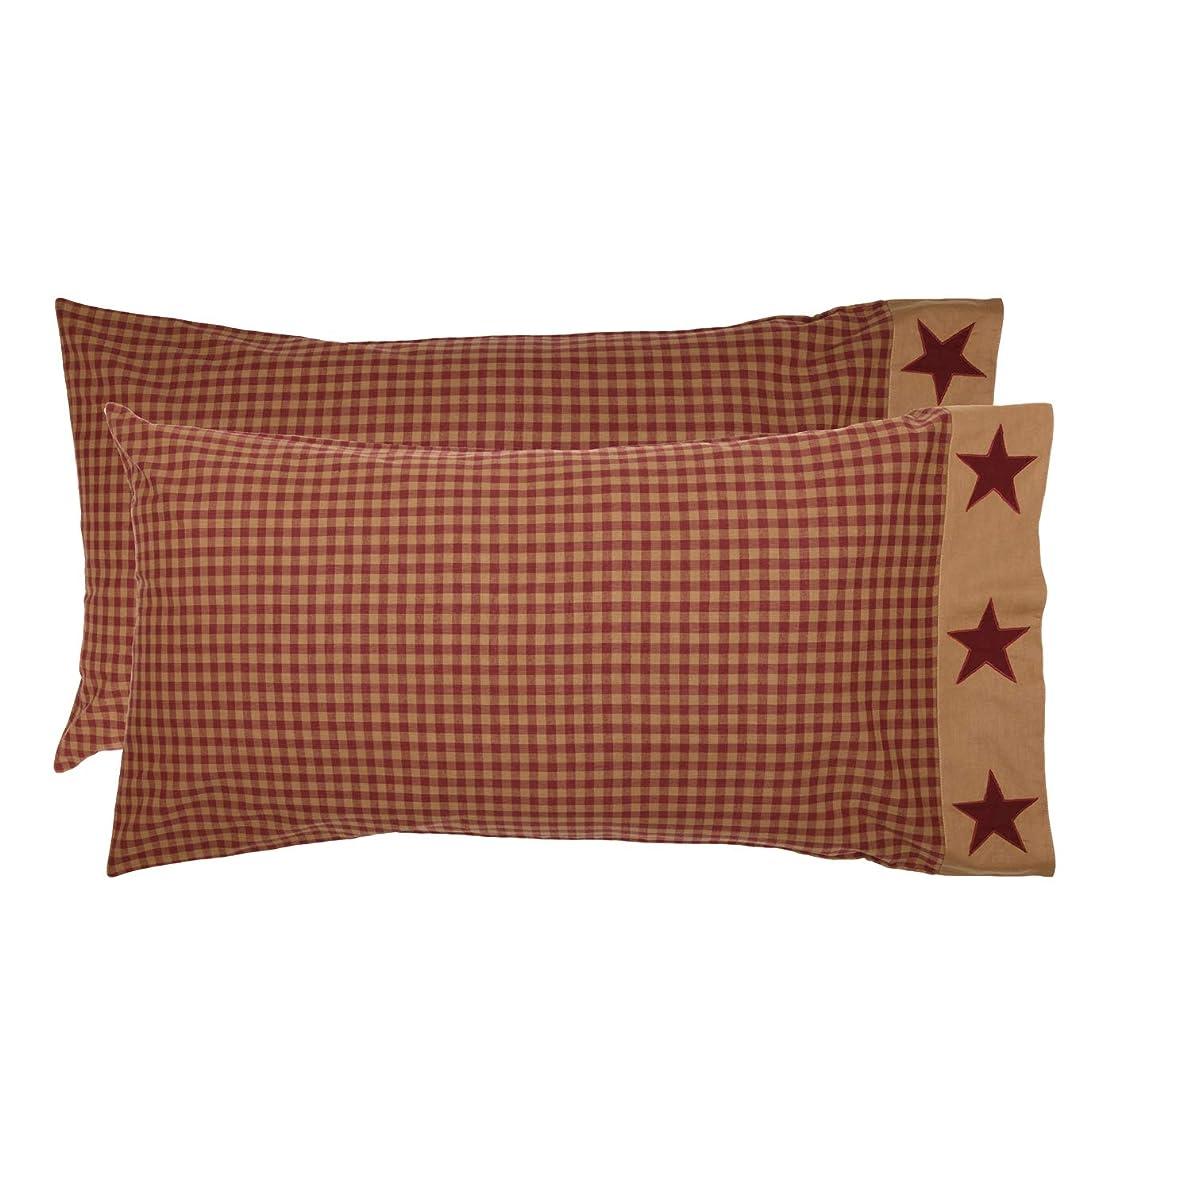 VHC Brands Primitive Bedding Cody Burgundy Border Cotton Appliqued Star King Pillow Case Set of 2 Red